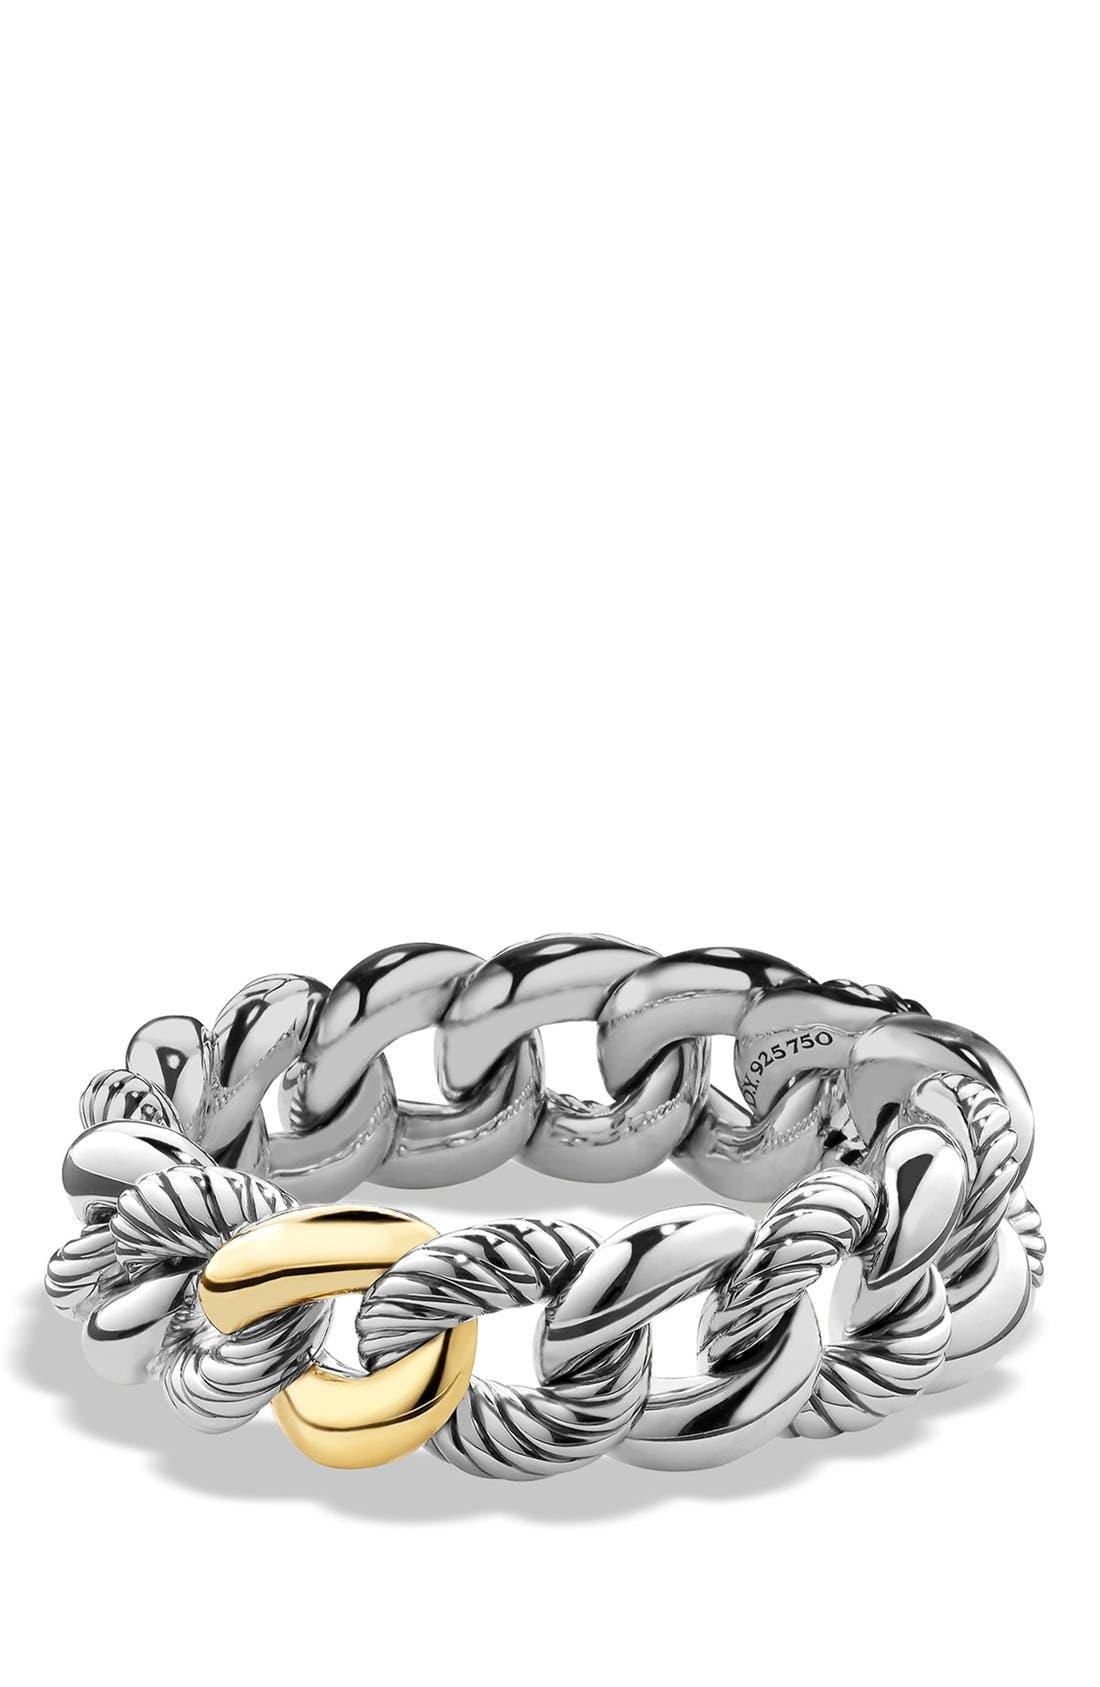 DAVID YURMAN Belmont Curb Link Bracelet with 18K Gold